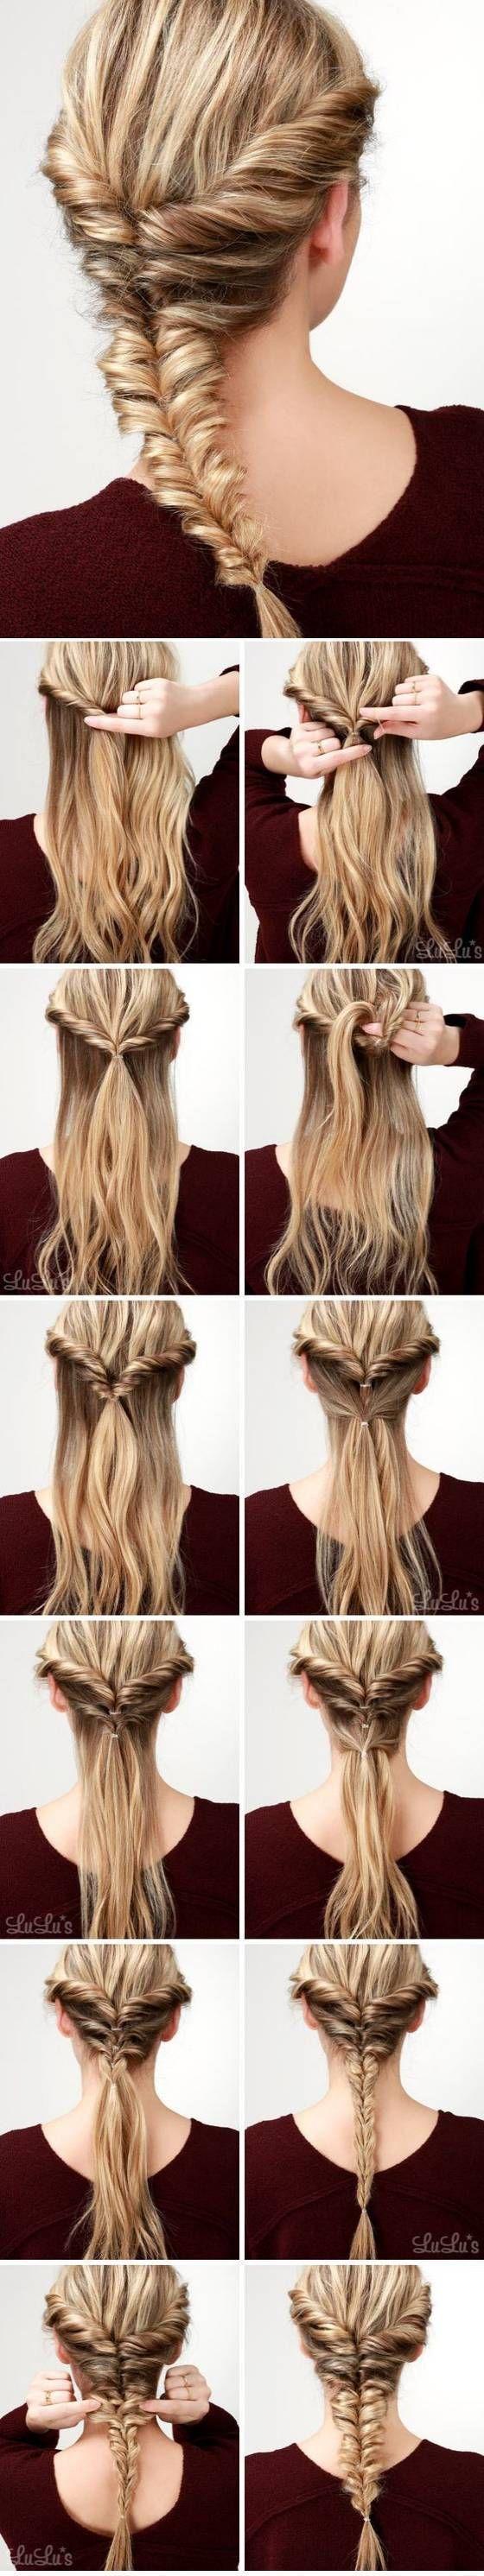 Hairstyle tutorial witj elegant braids – Tutorial peinado trenzado, trenzas esti…